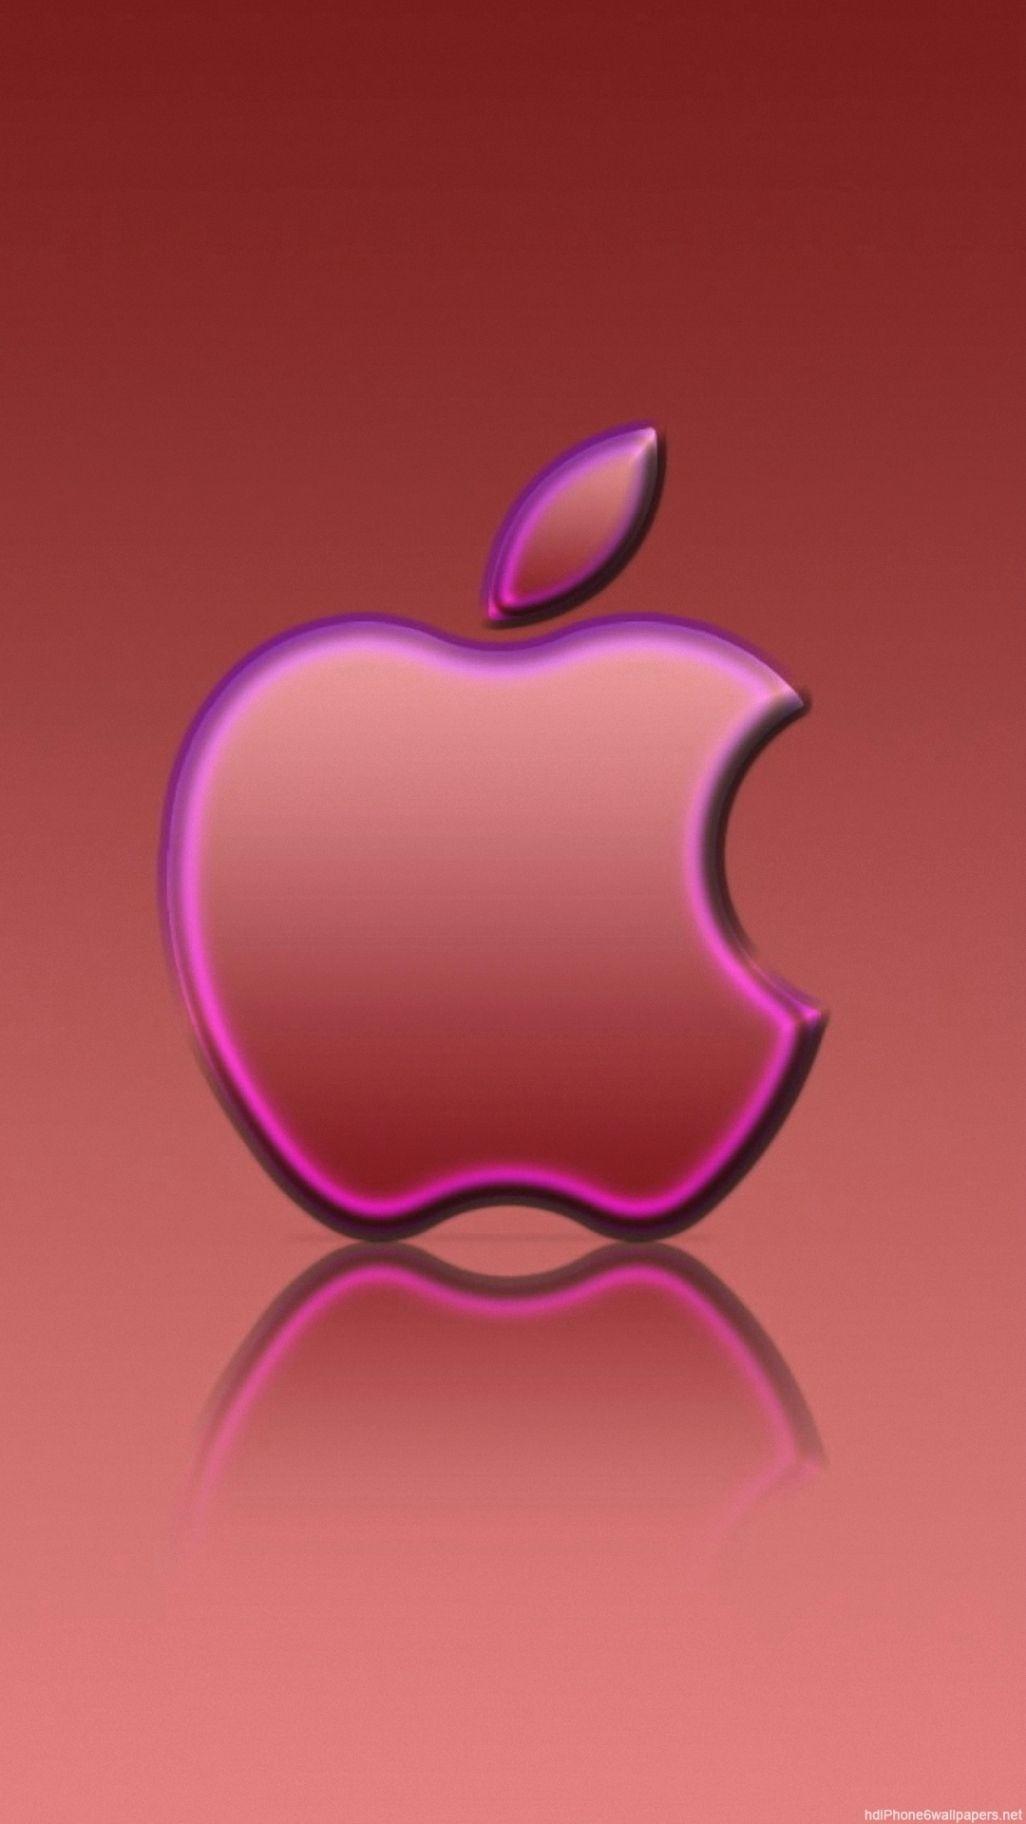 Apple Iphone 6 Plus Wallpapers On Wallpaperdog